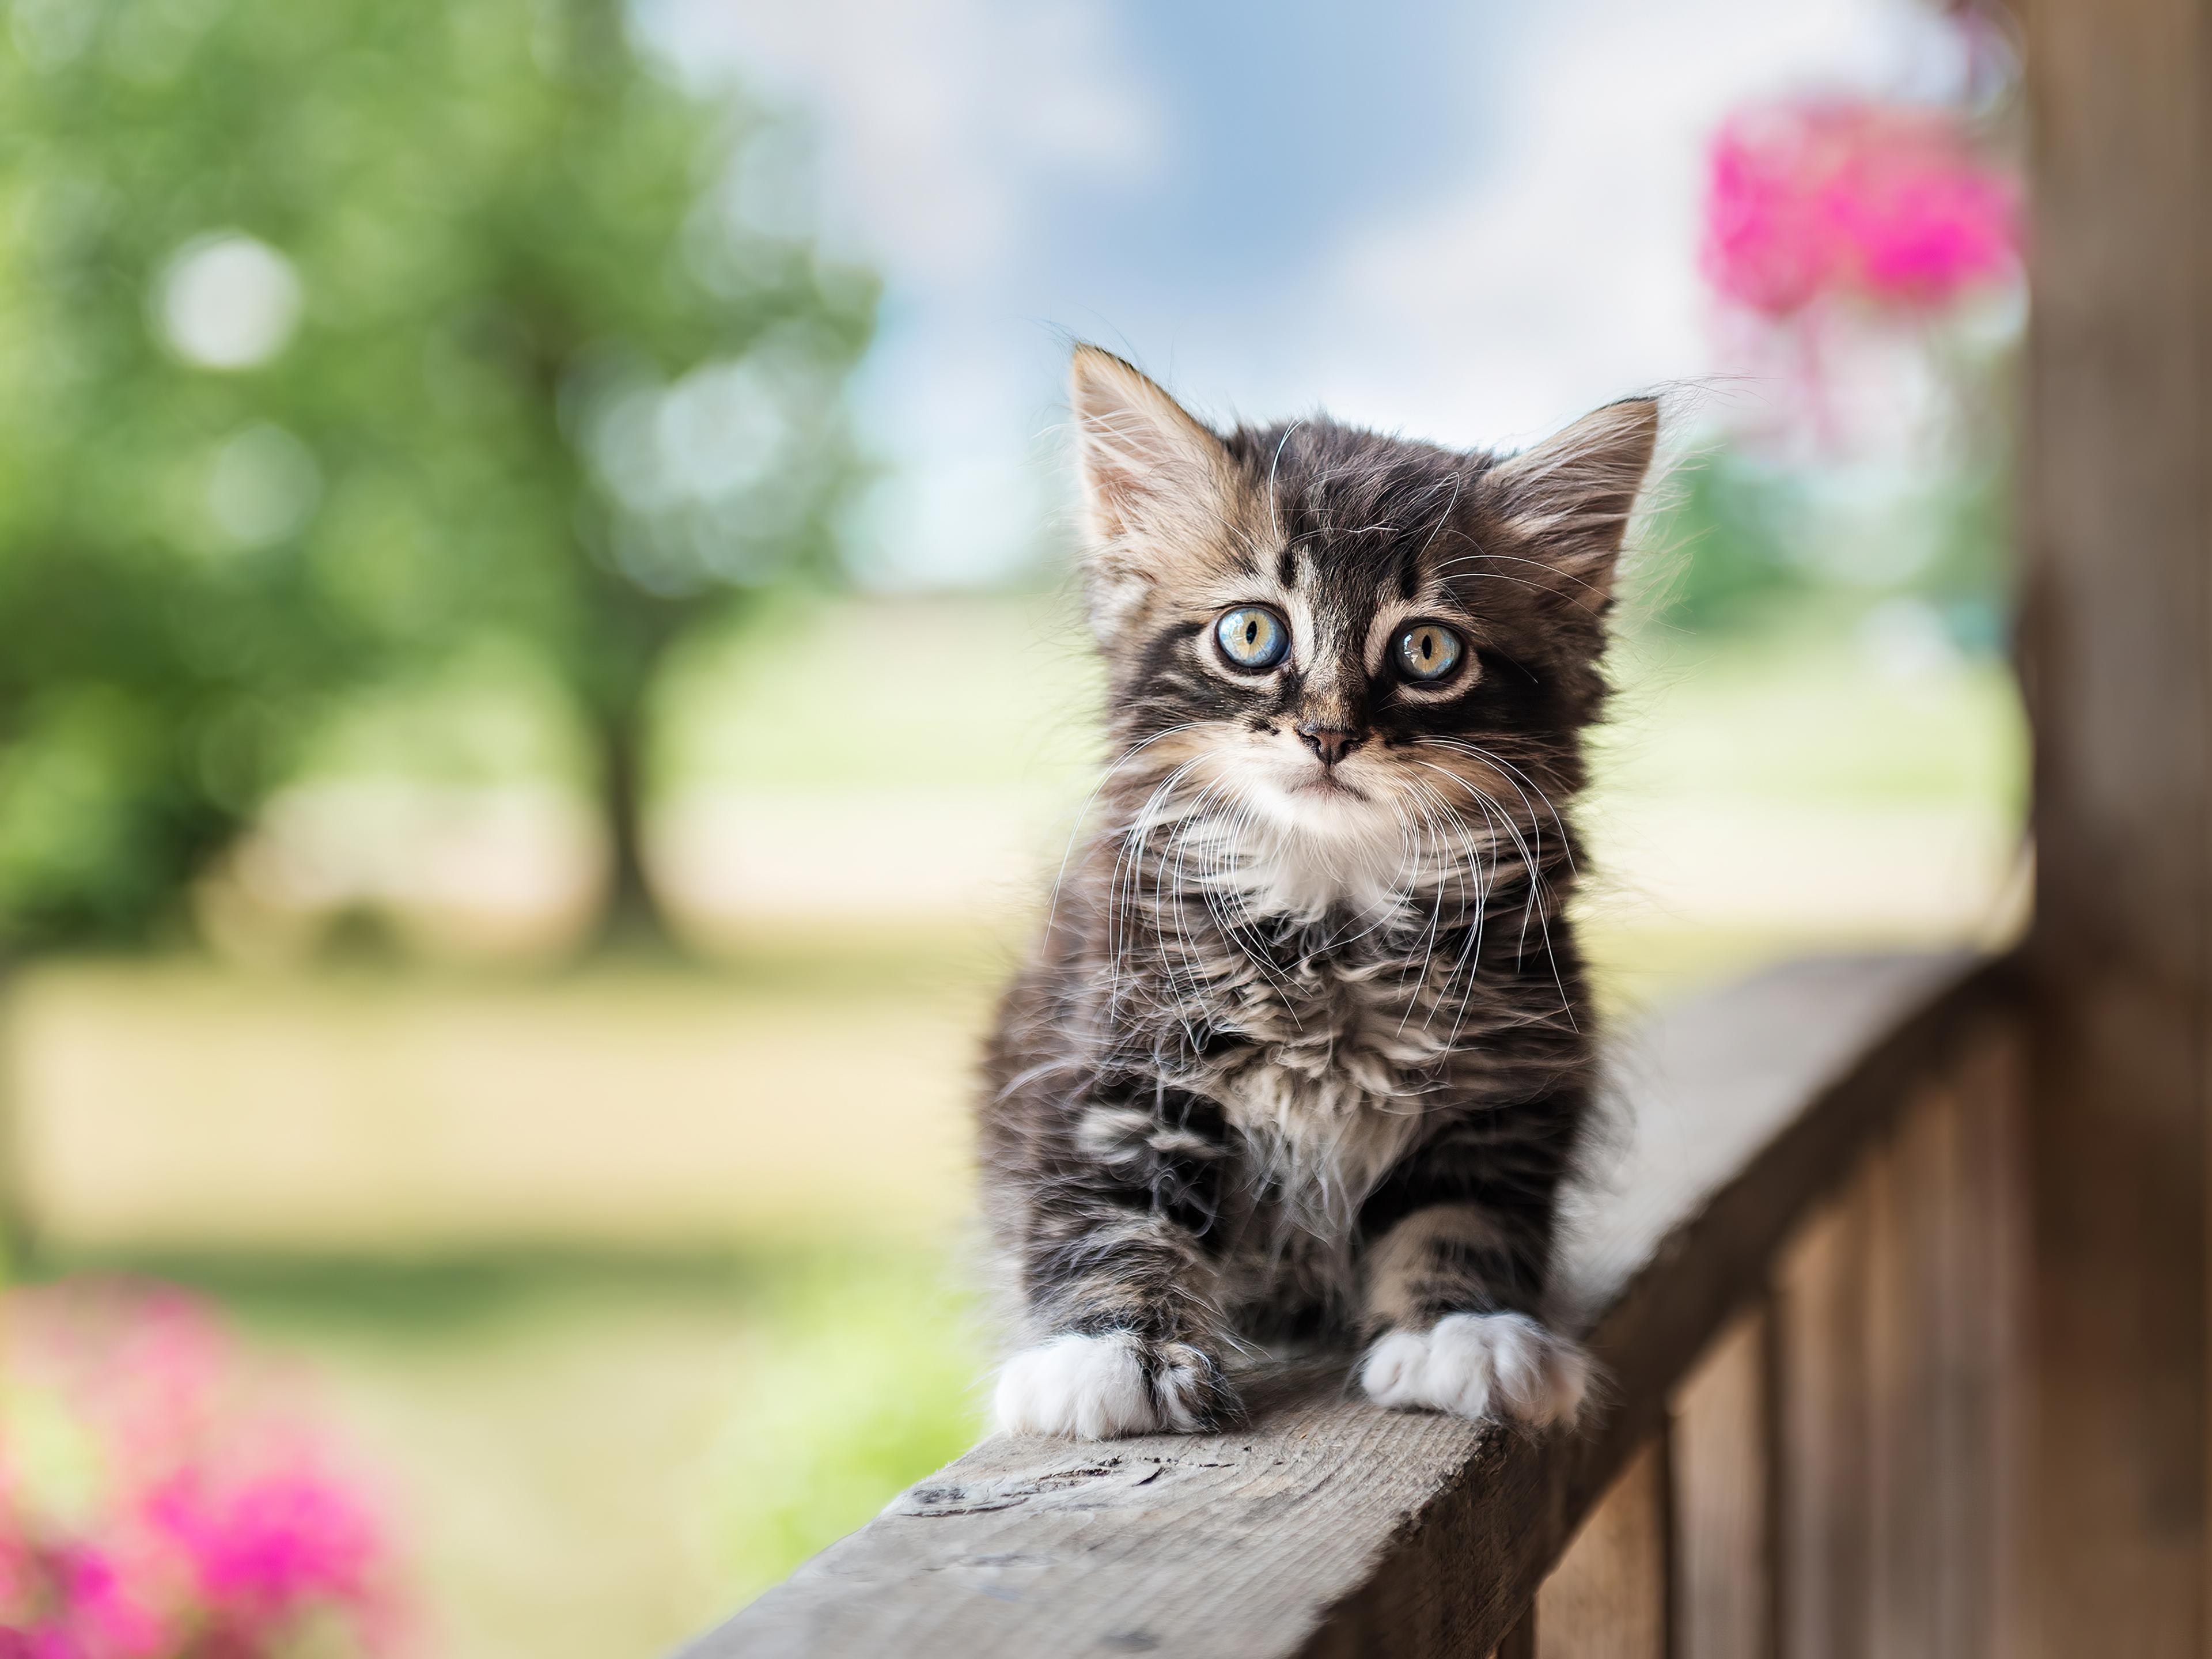 cute cat 4k 1615884666 - Cute Cat 4k - Cute Cat 4k wallpapers